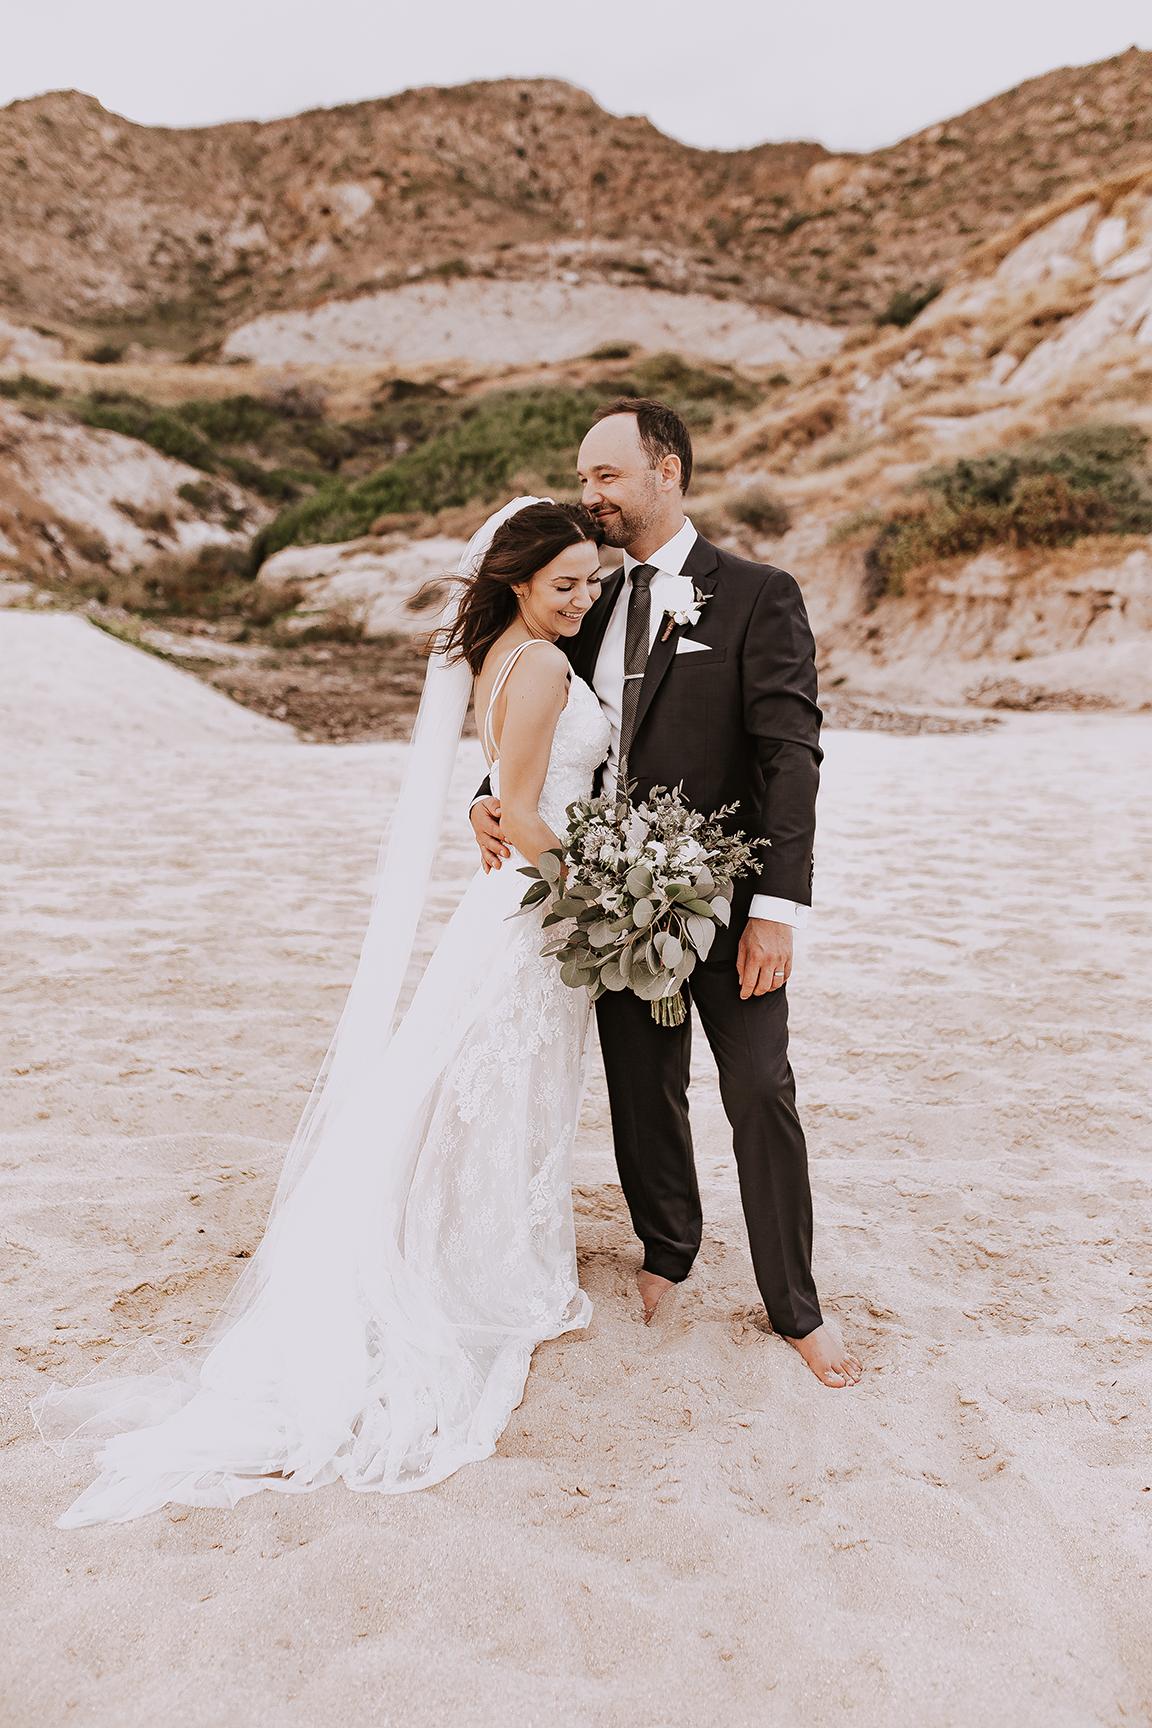 Lindsei+James_cabo_wedding_635.jpg